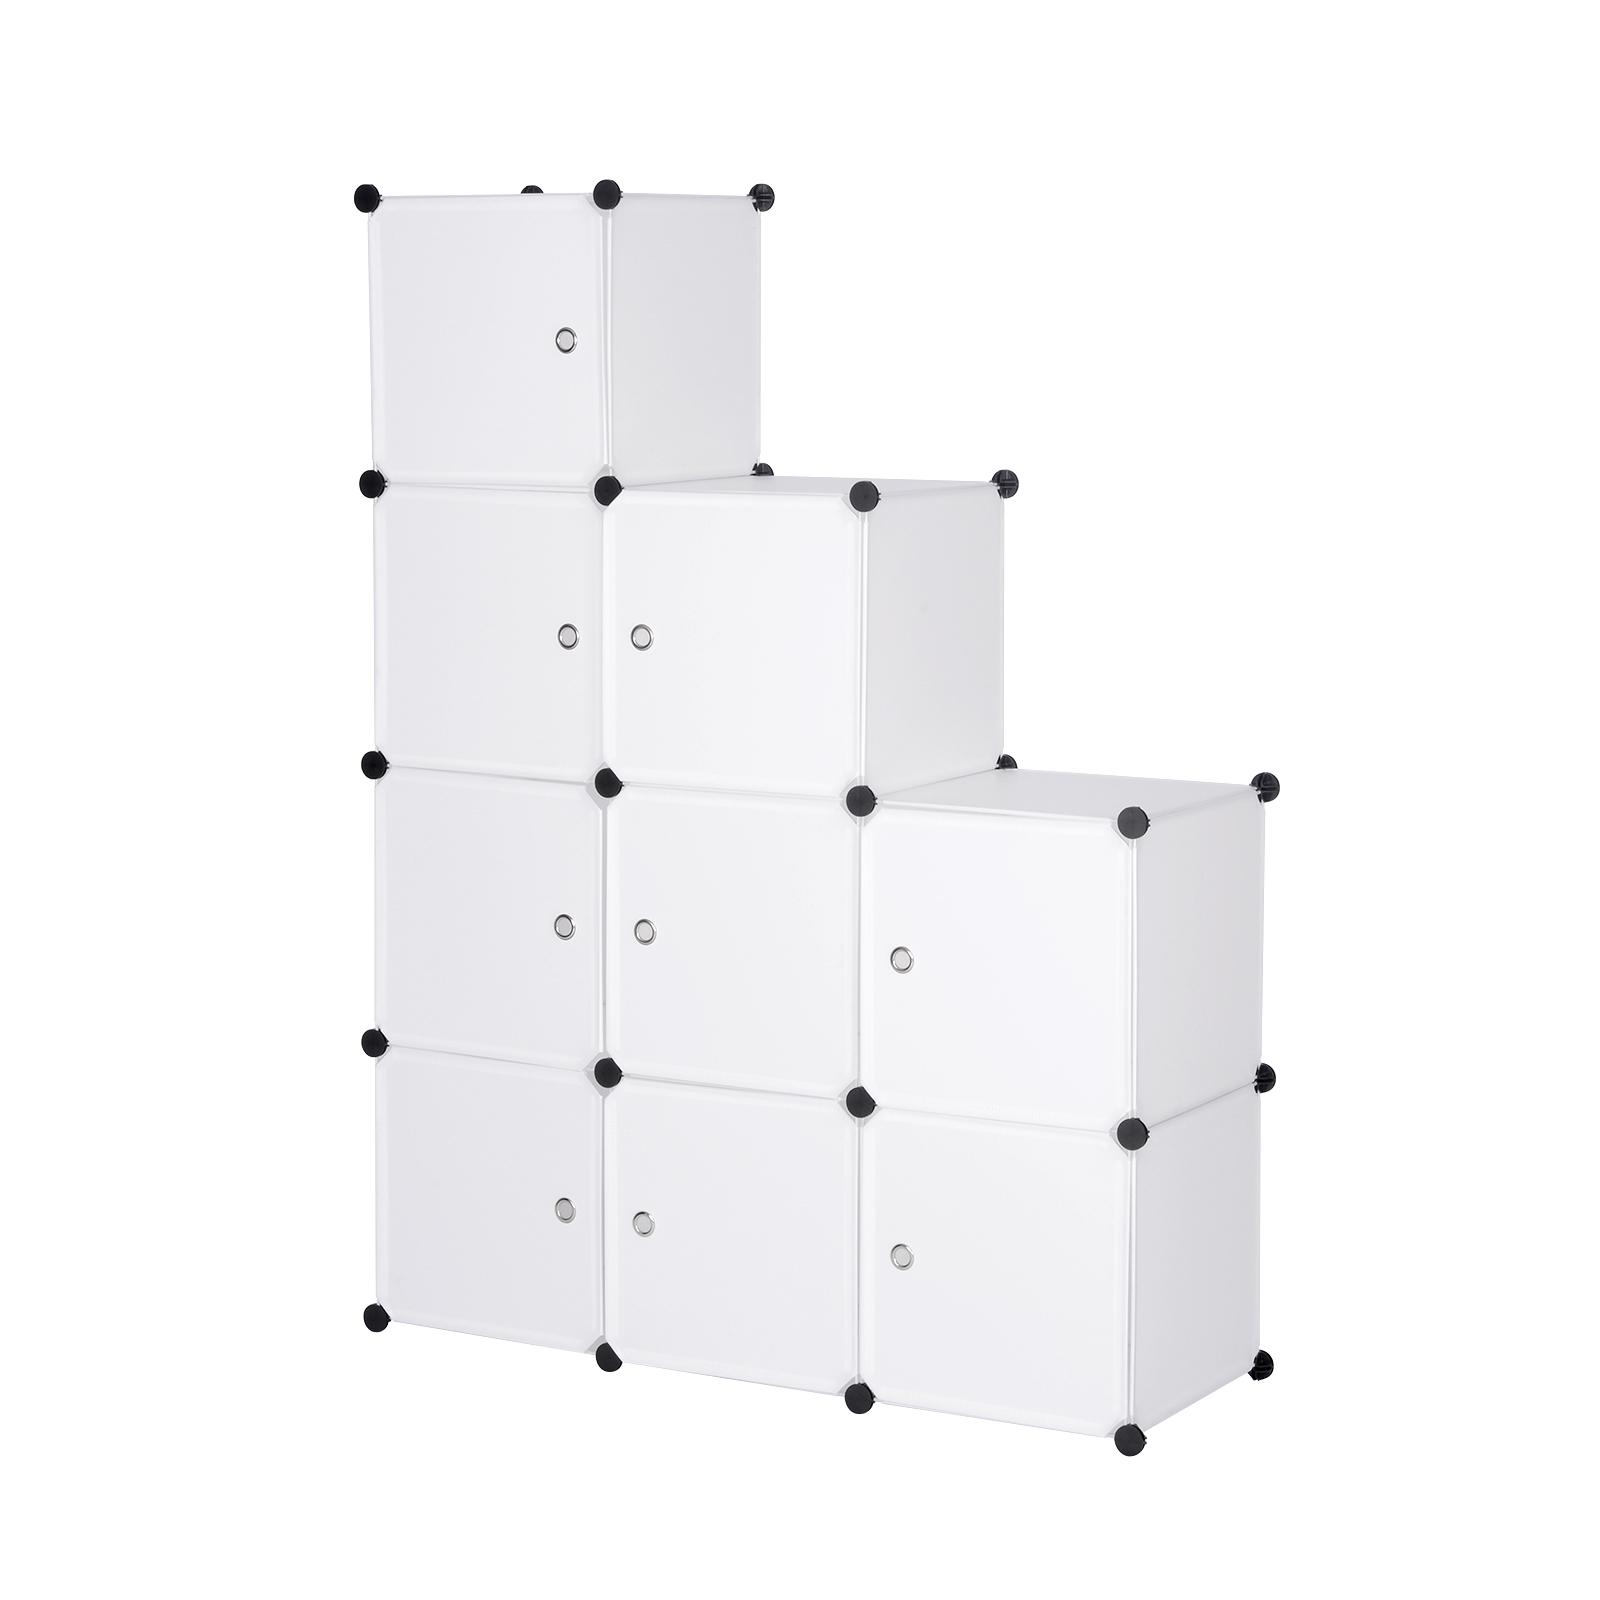 kleiderschrank garderobenschrank diy regalsystem. Black Bedroom Furniture Sets. Home Design Ideas